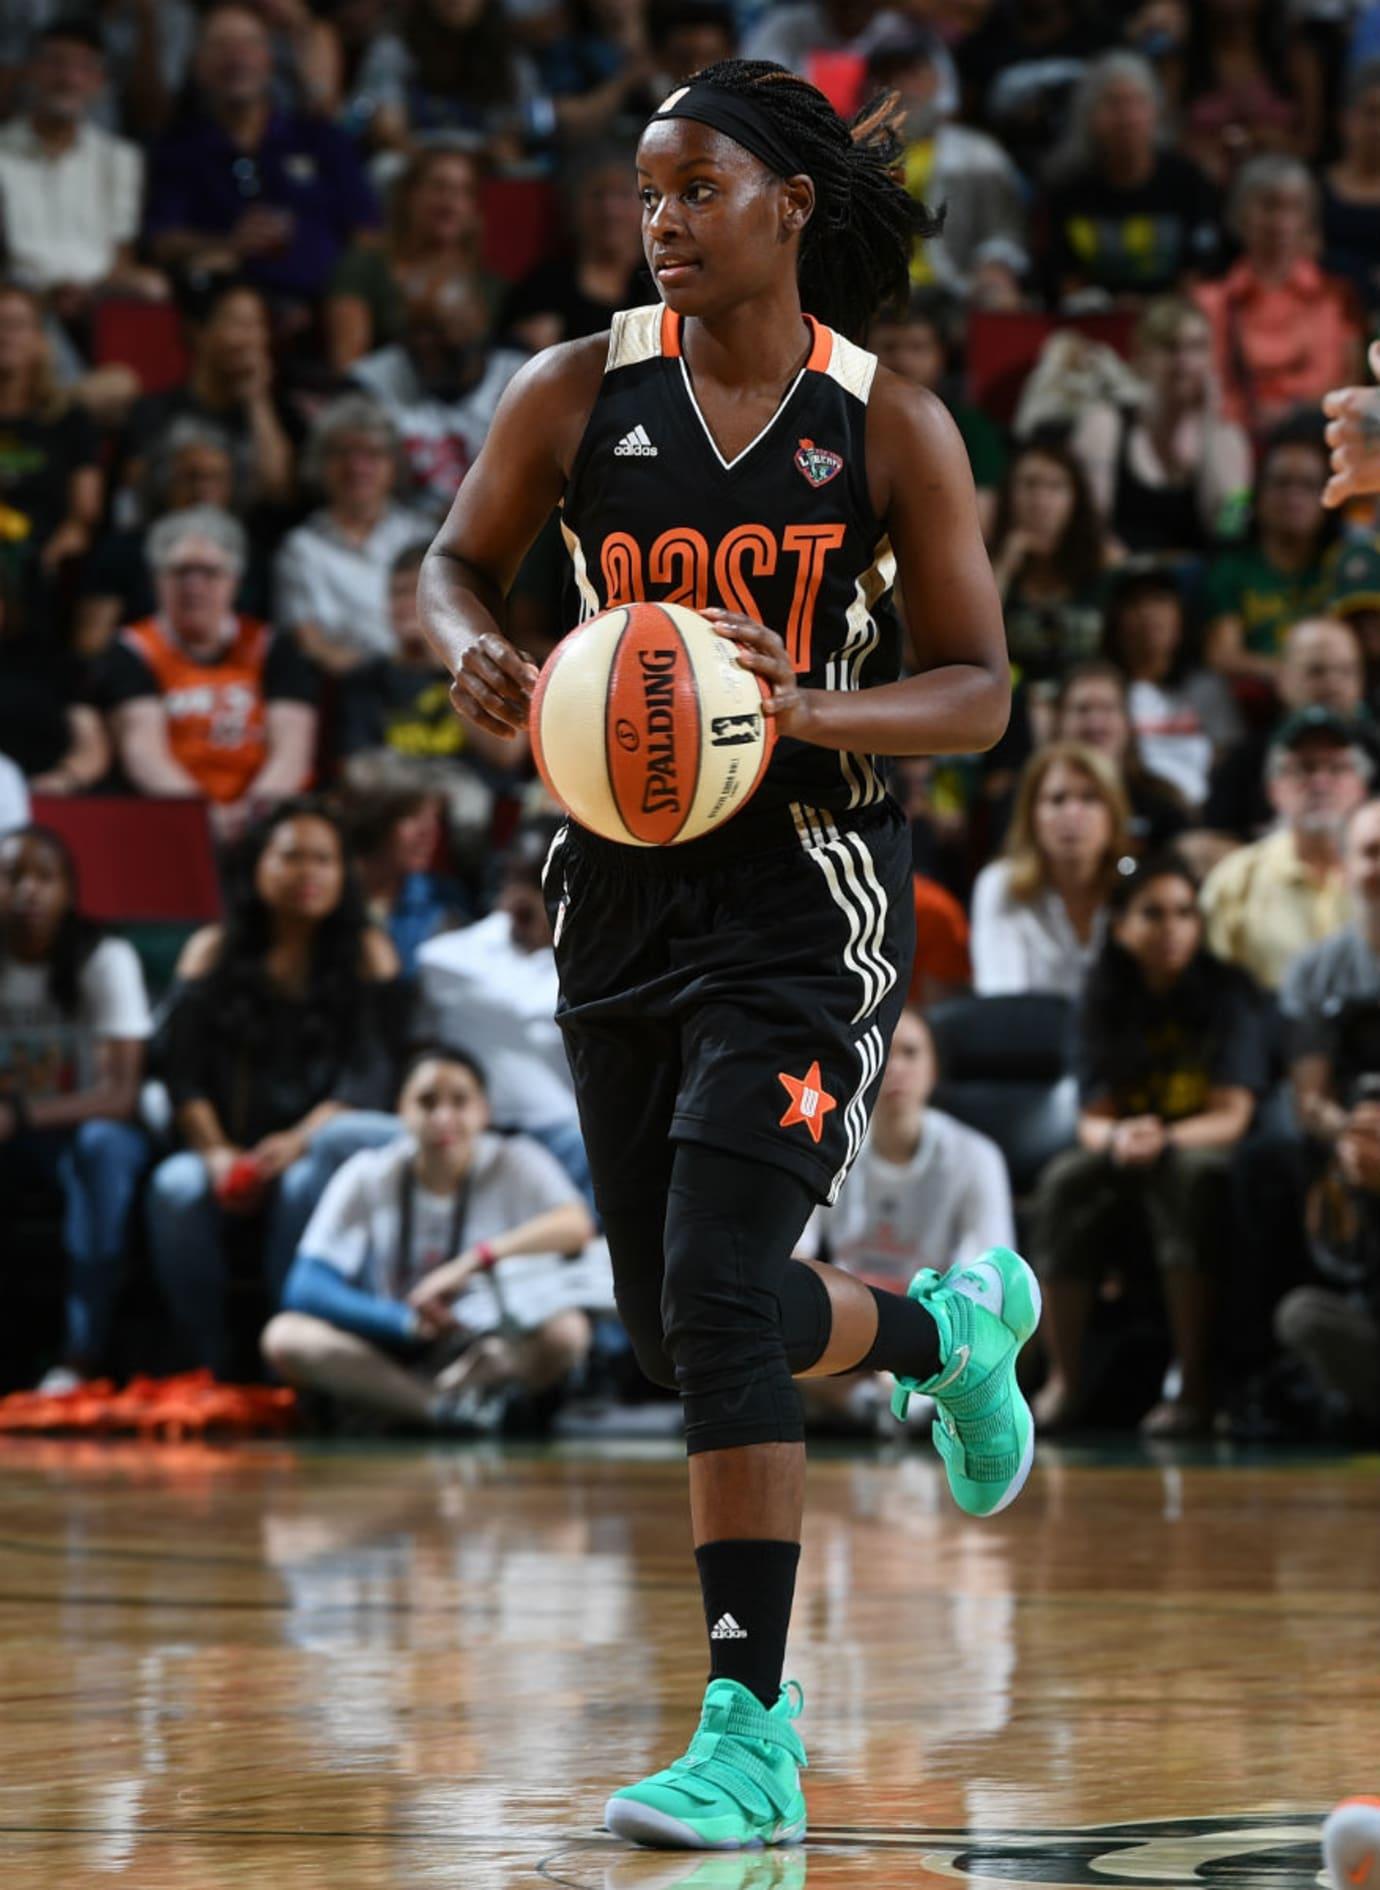 ab7ed1d9d61 Sugar Rodgers Nike LeBron Soldier 11 WNBA All-Star PE